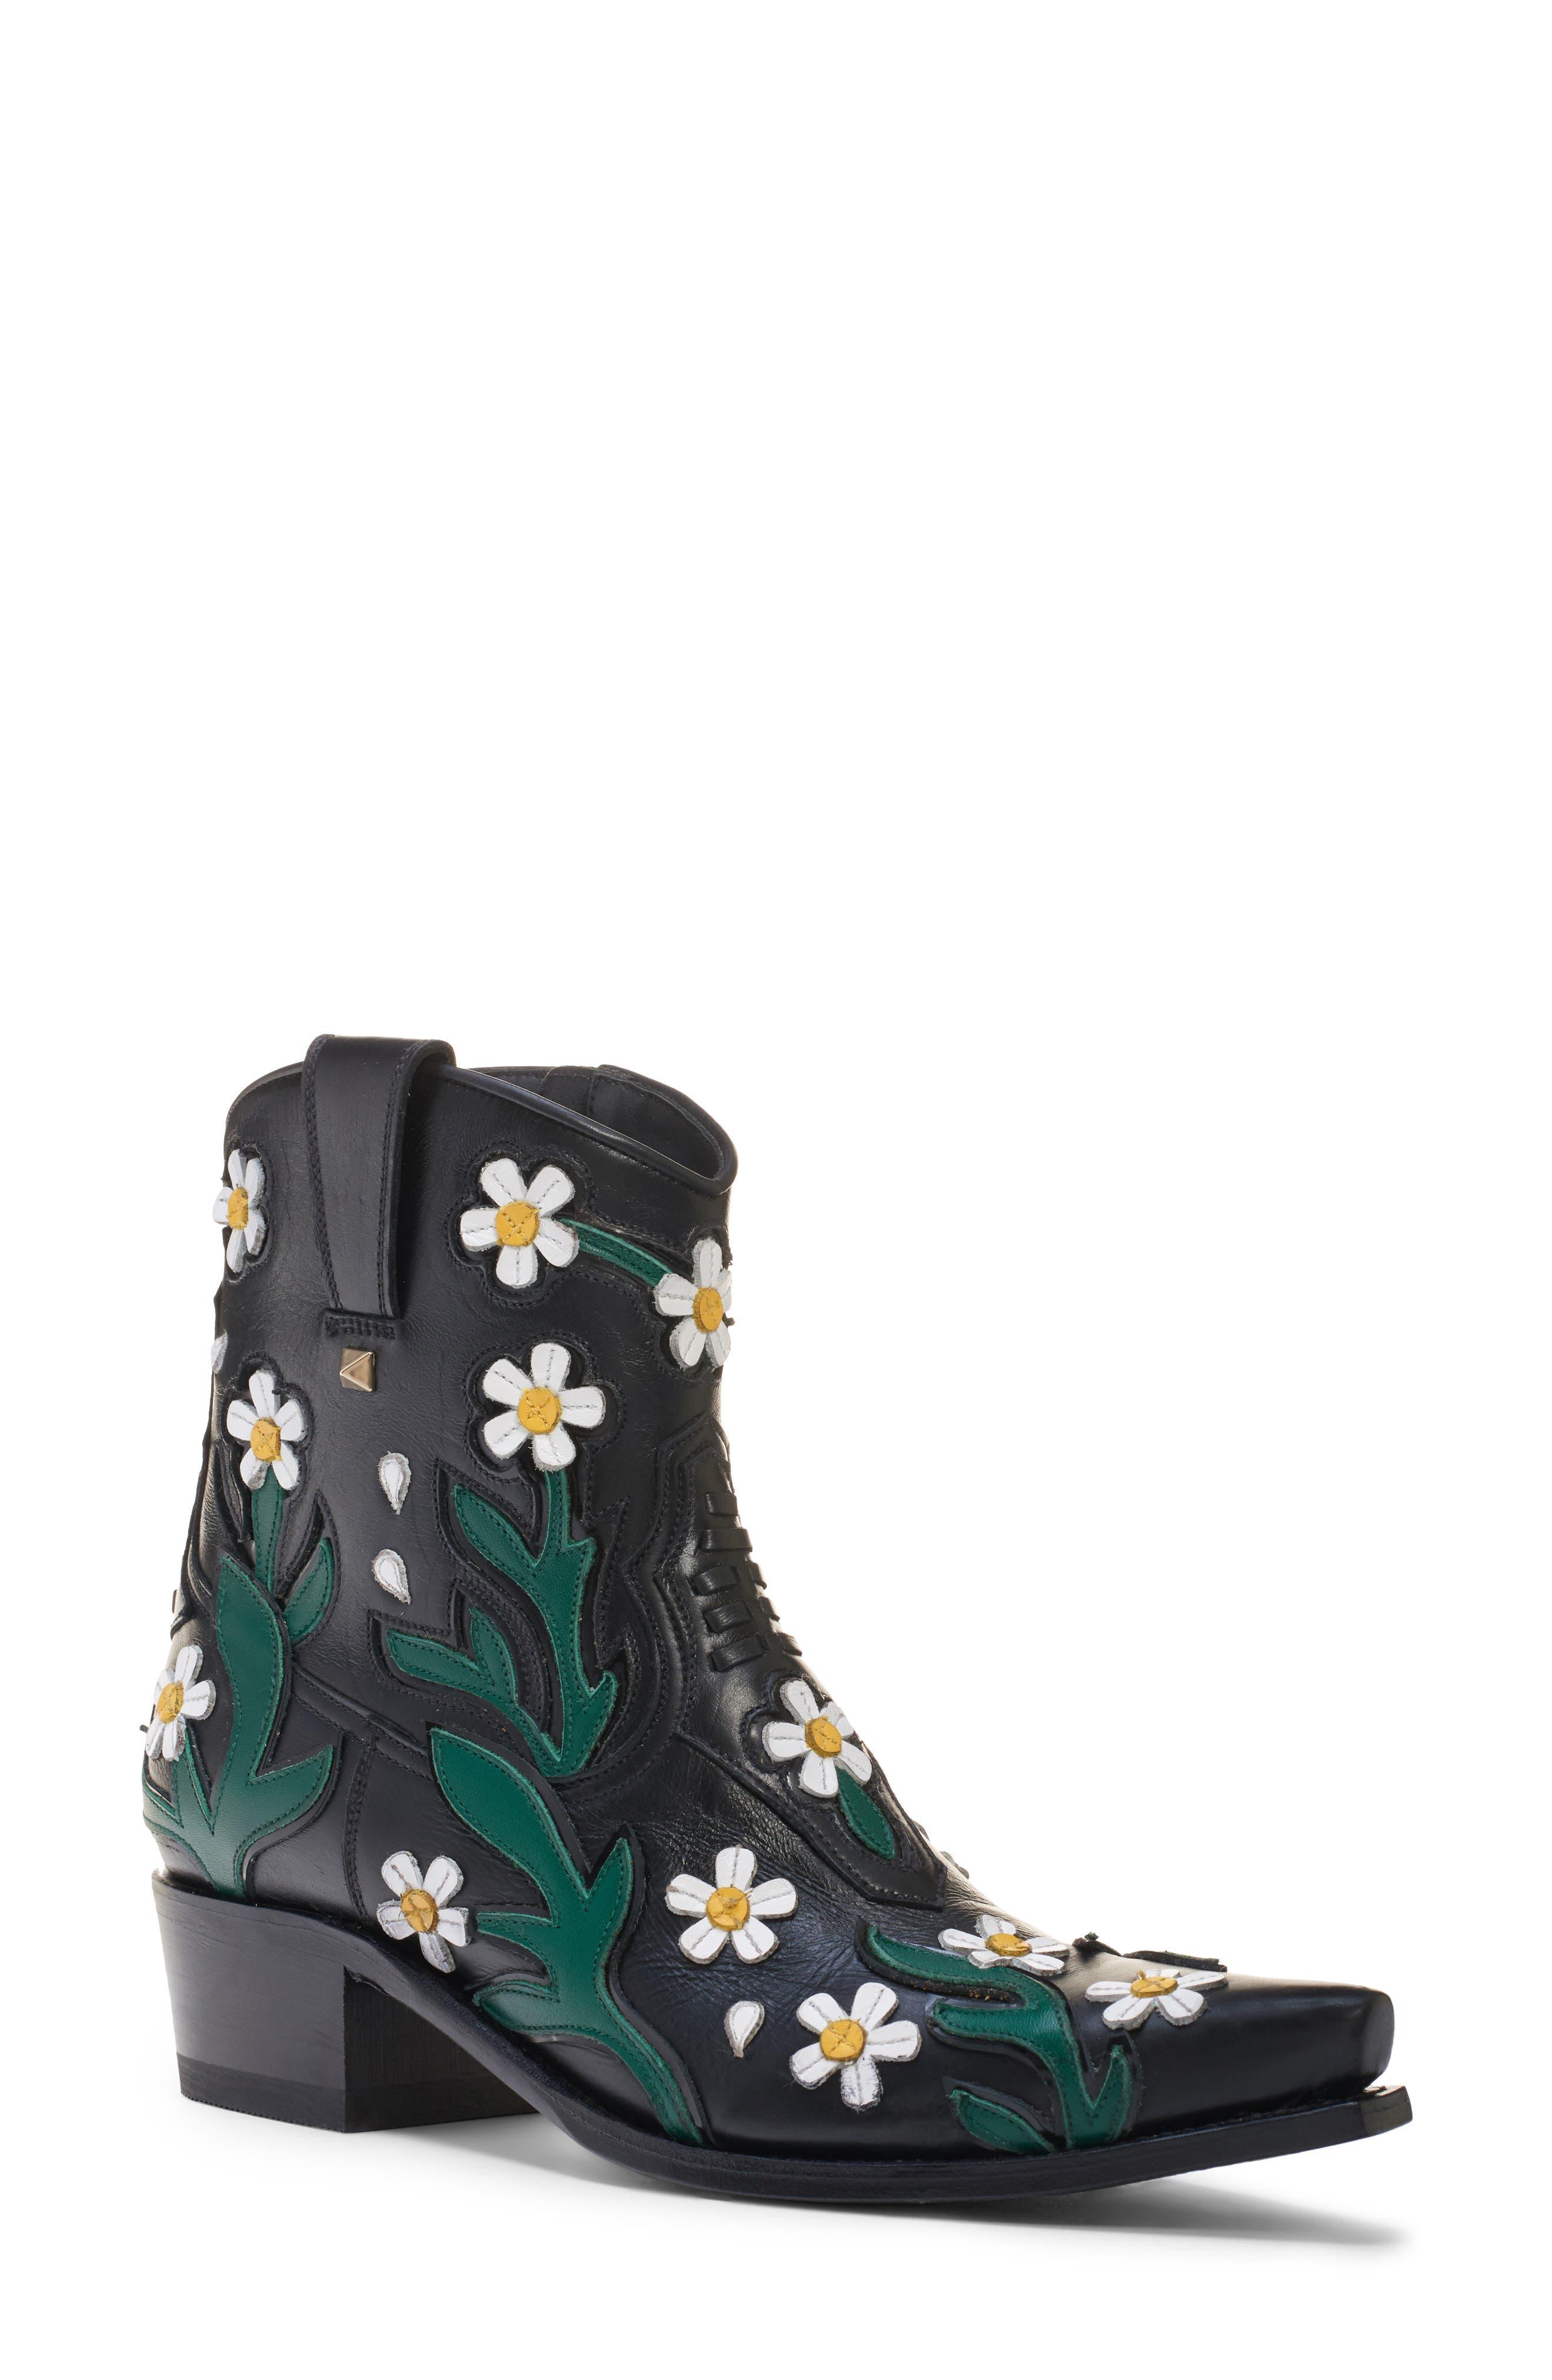 Ranch Daisy Applique Boots in Black